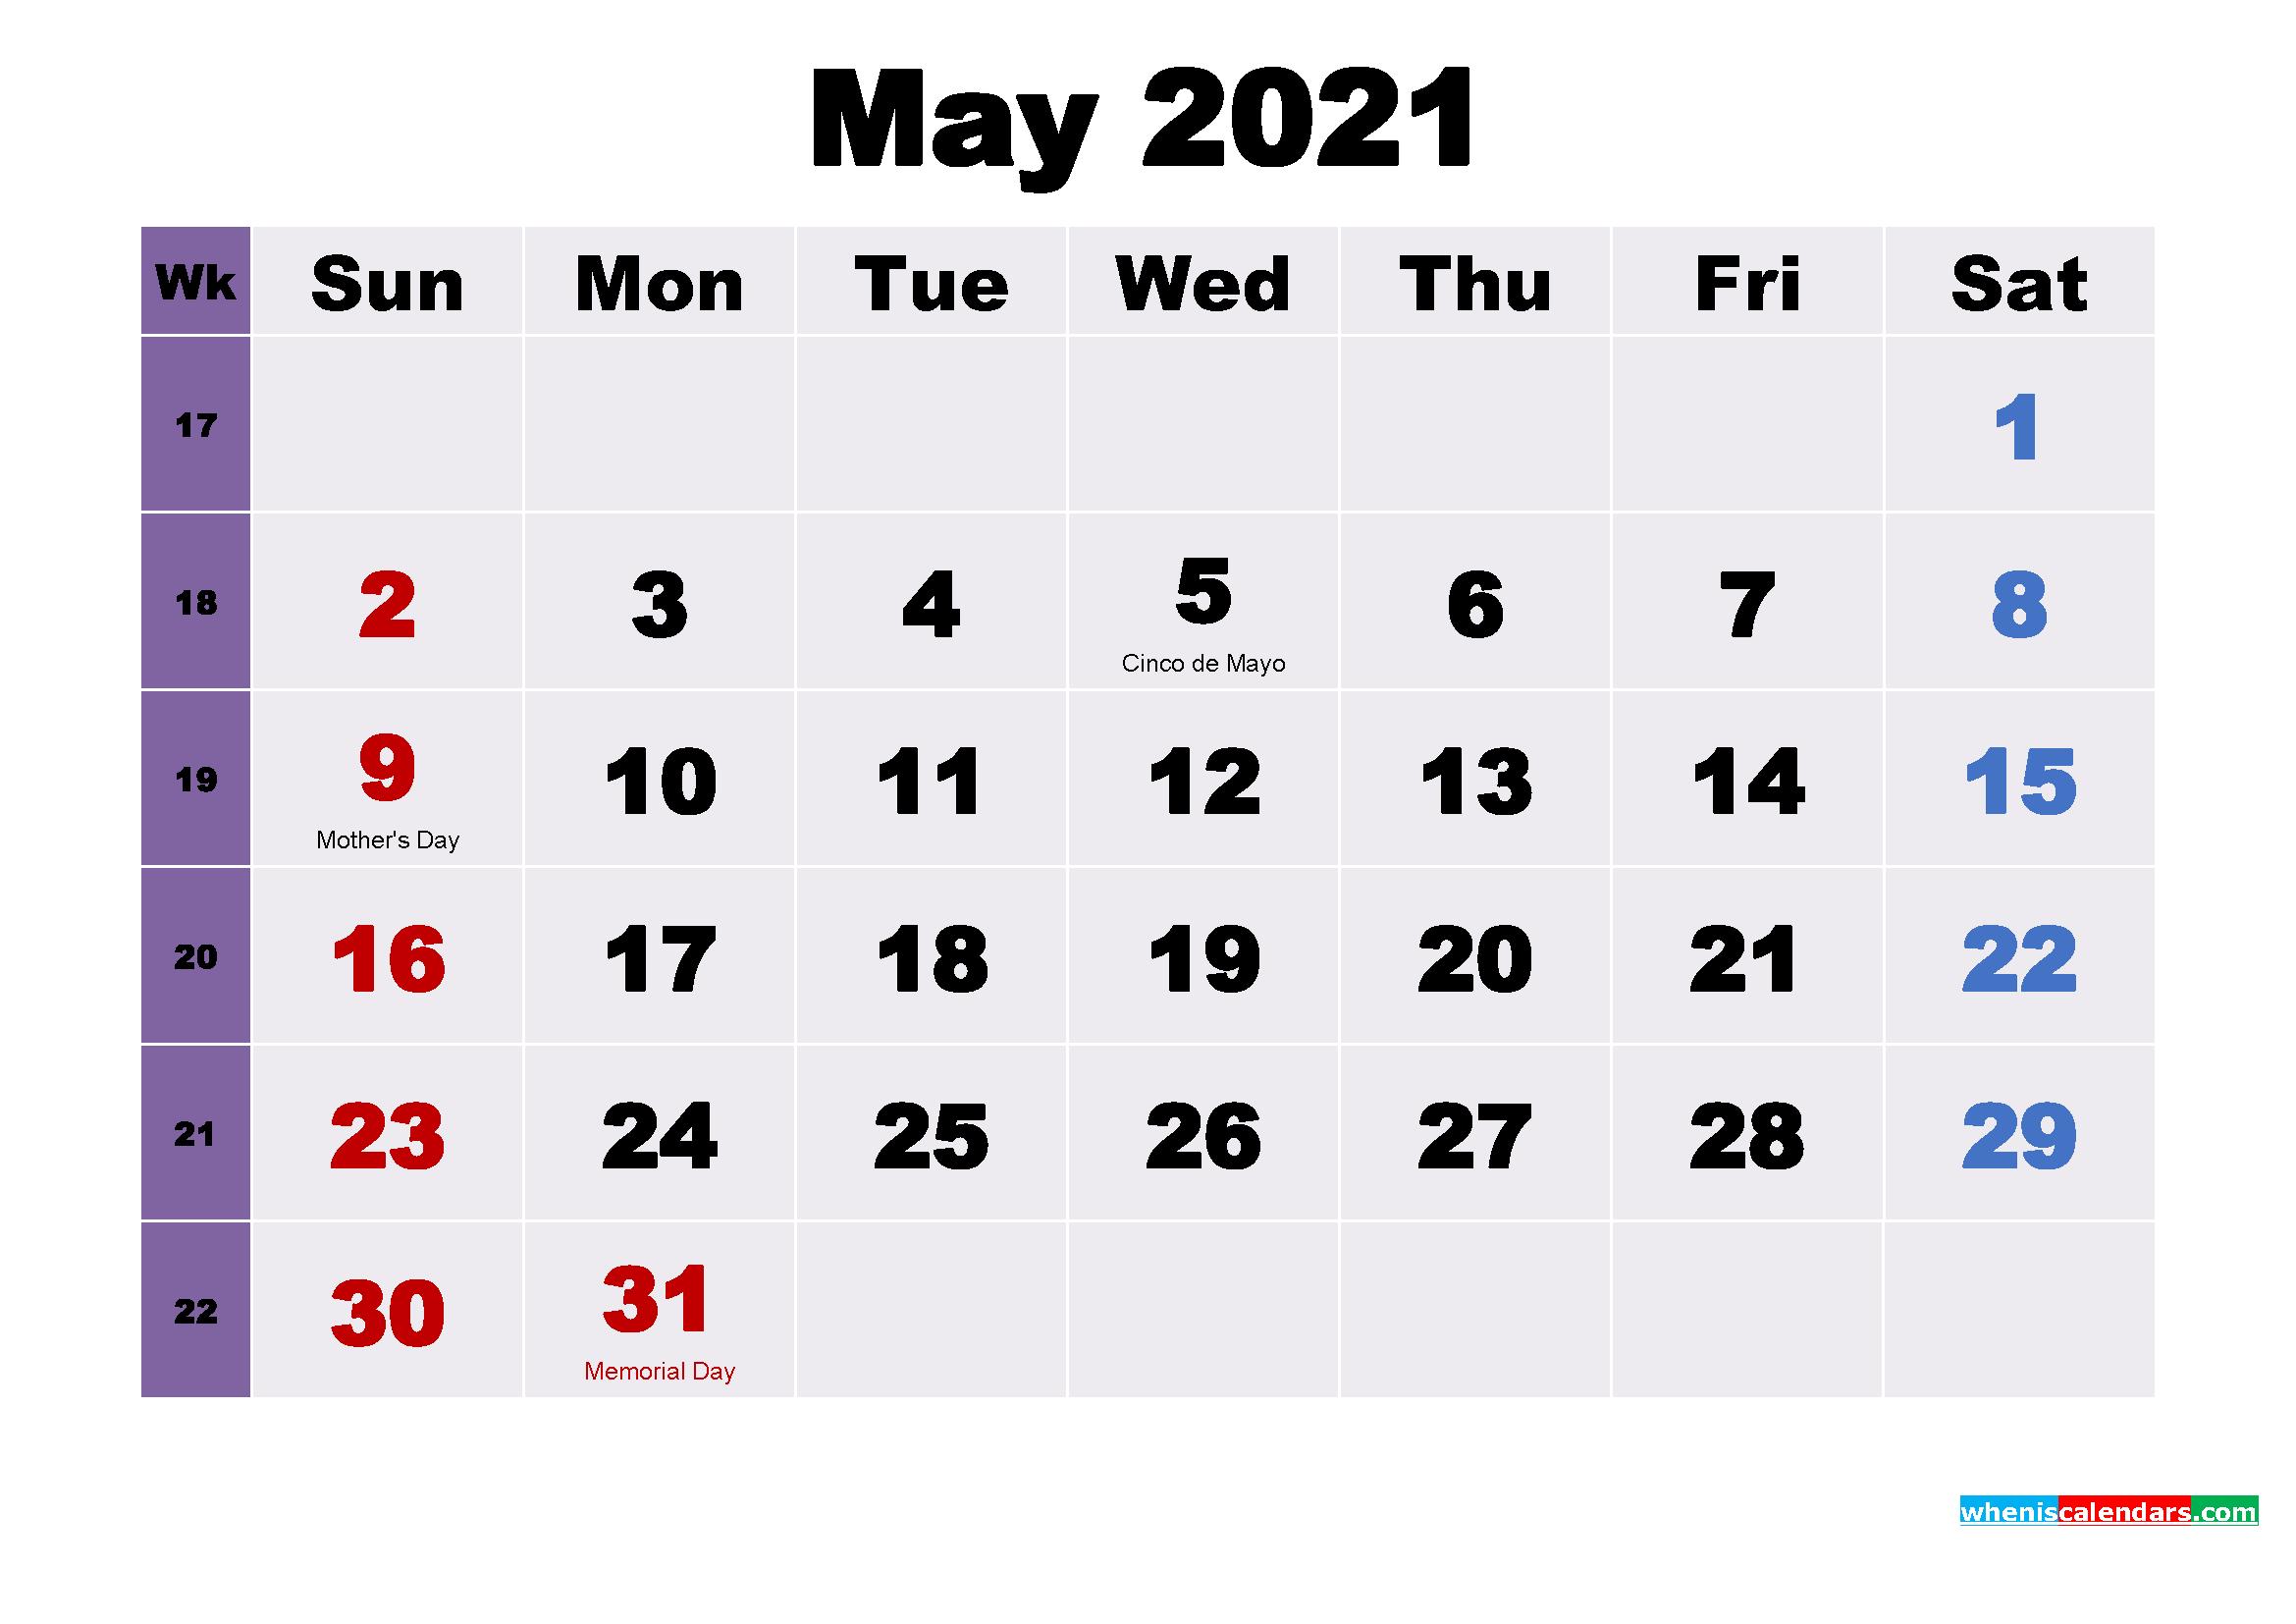 May 2021 Calendar with Holidays Wallpaper